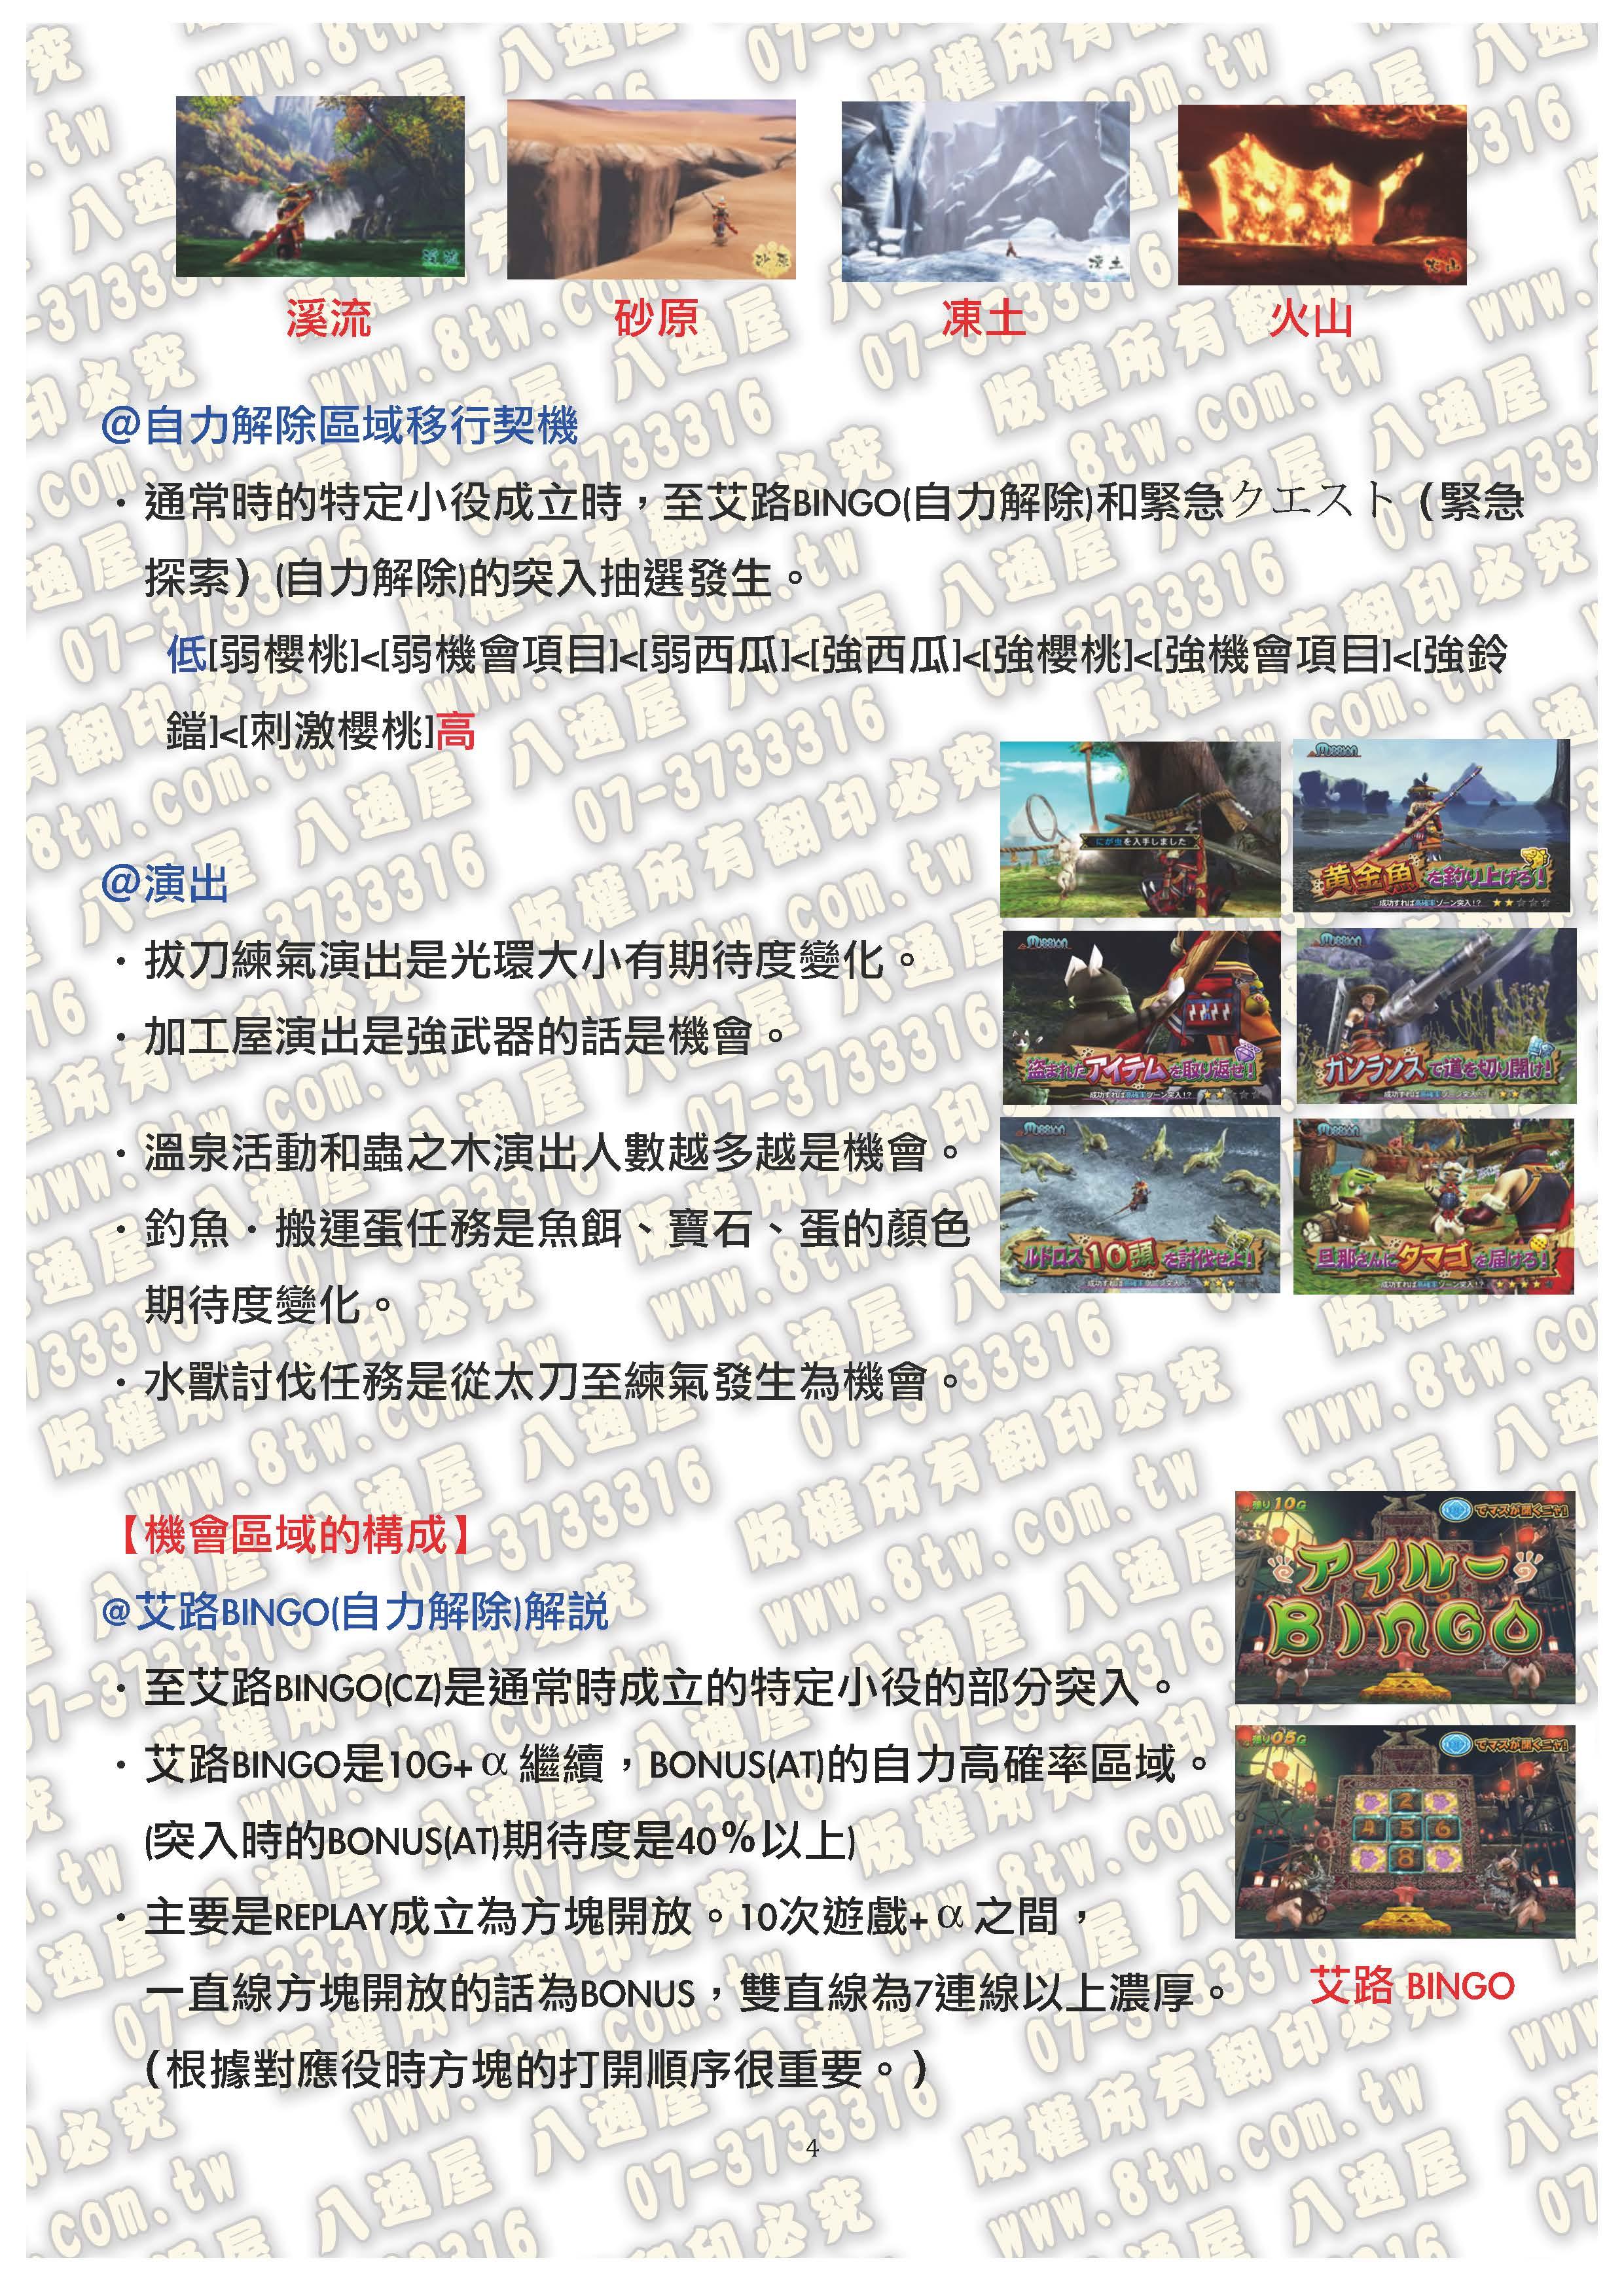 S0202魔物獵人 月下雷鳴 中文版攻略_Page_05